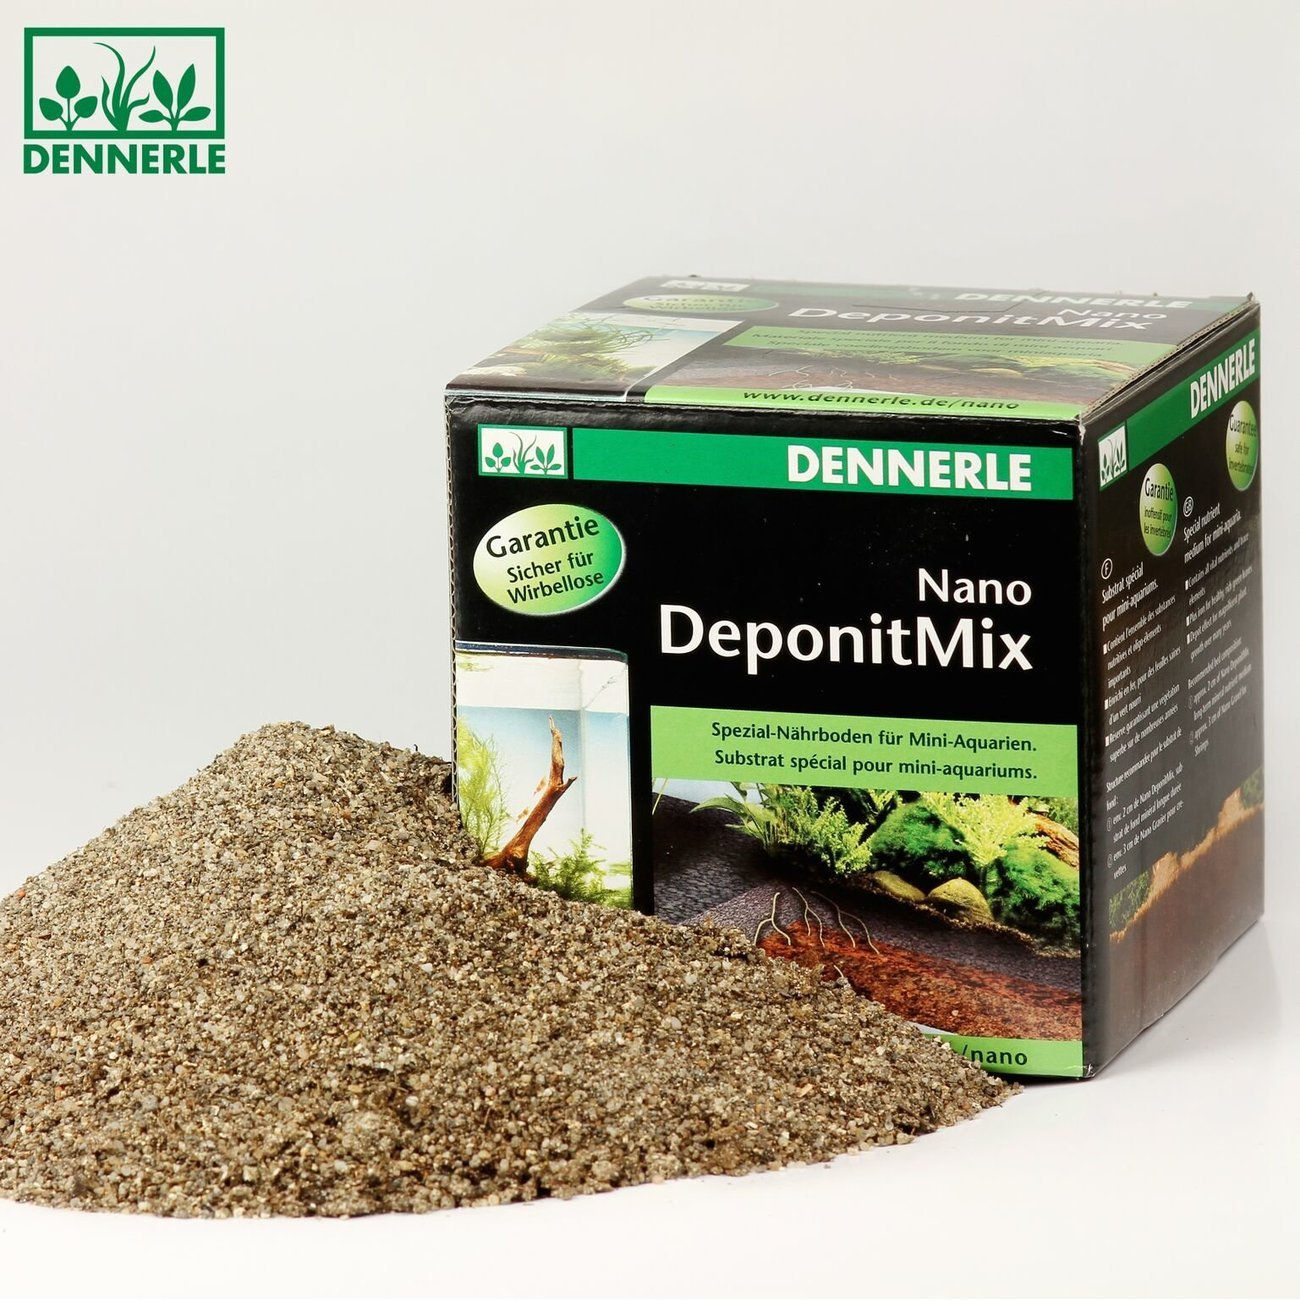 Dennerle Nano Deponit Mix, Bild 2